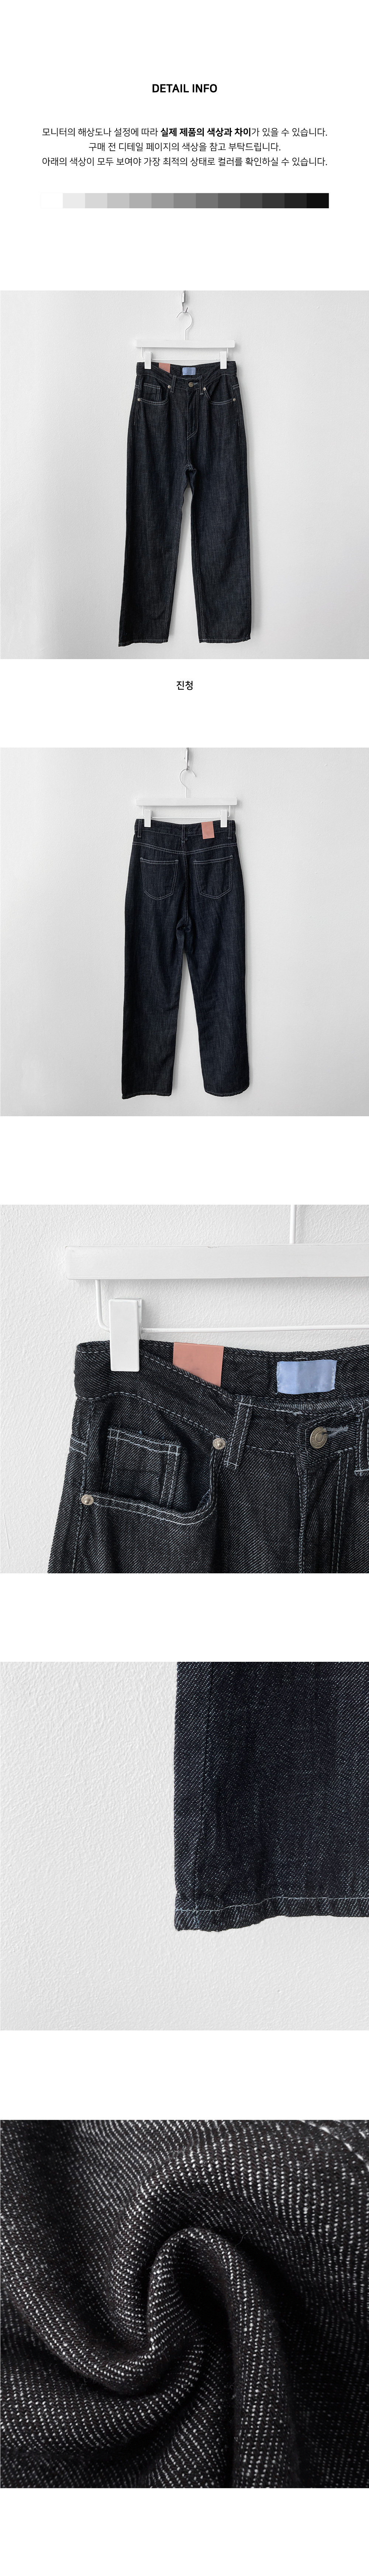 Ricoh Raw wide denim trousers